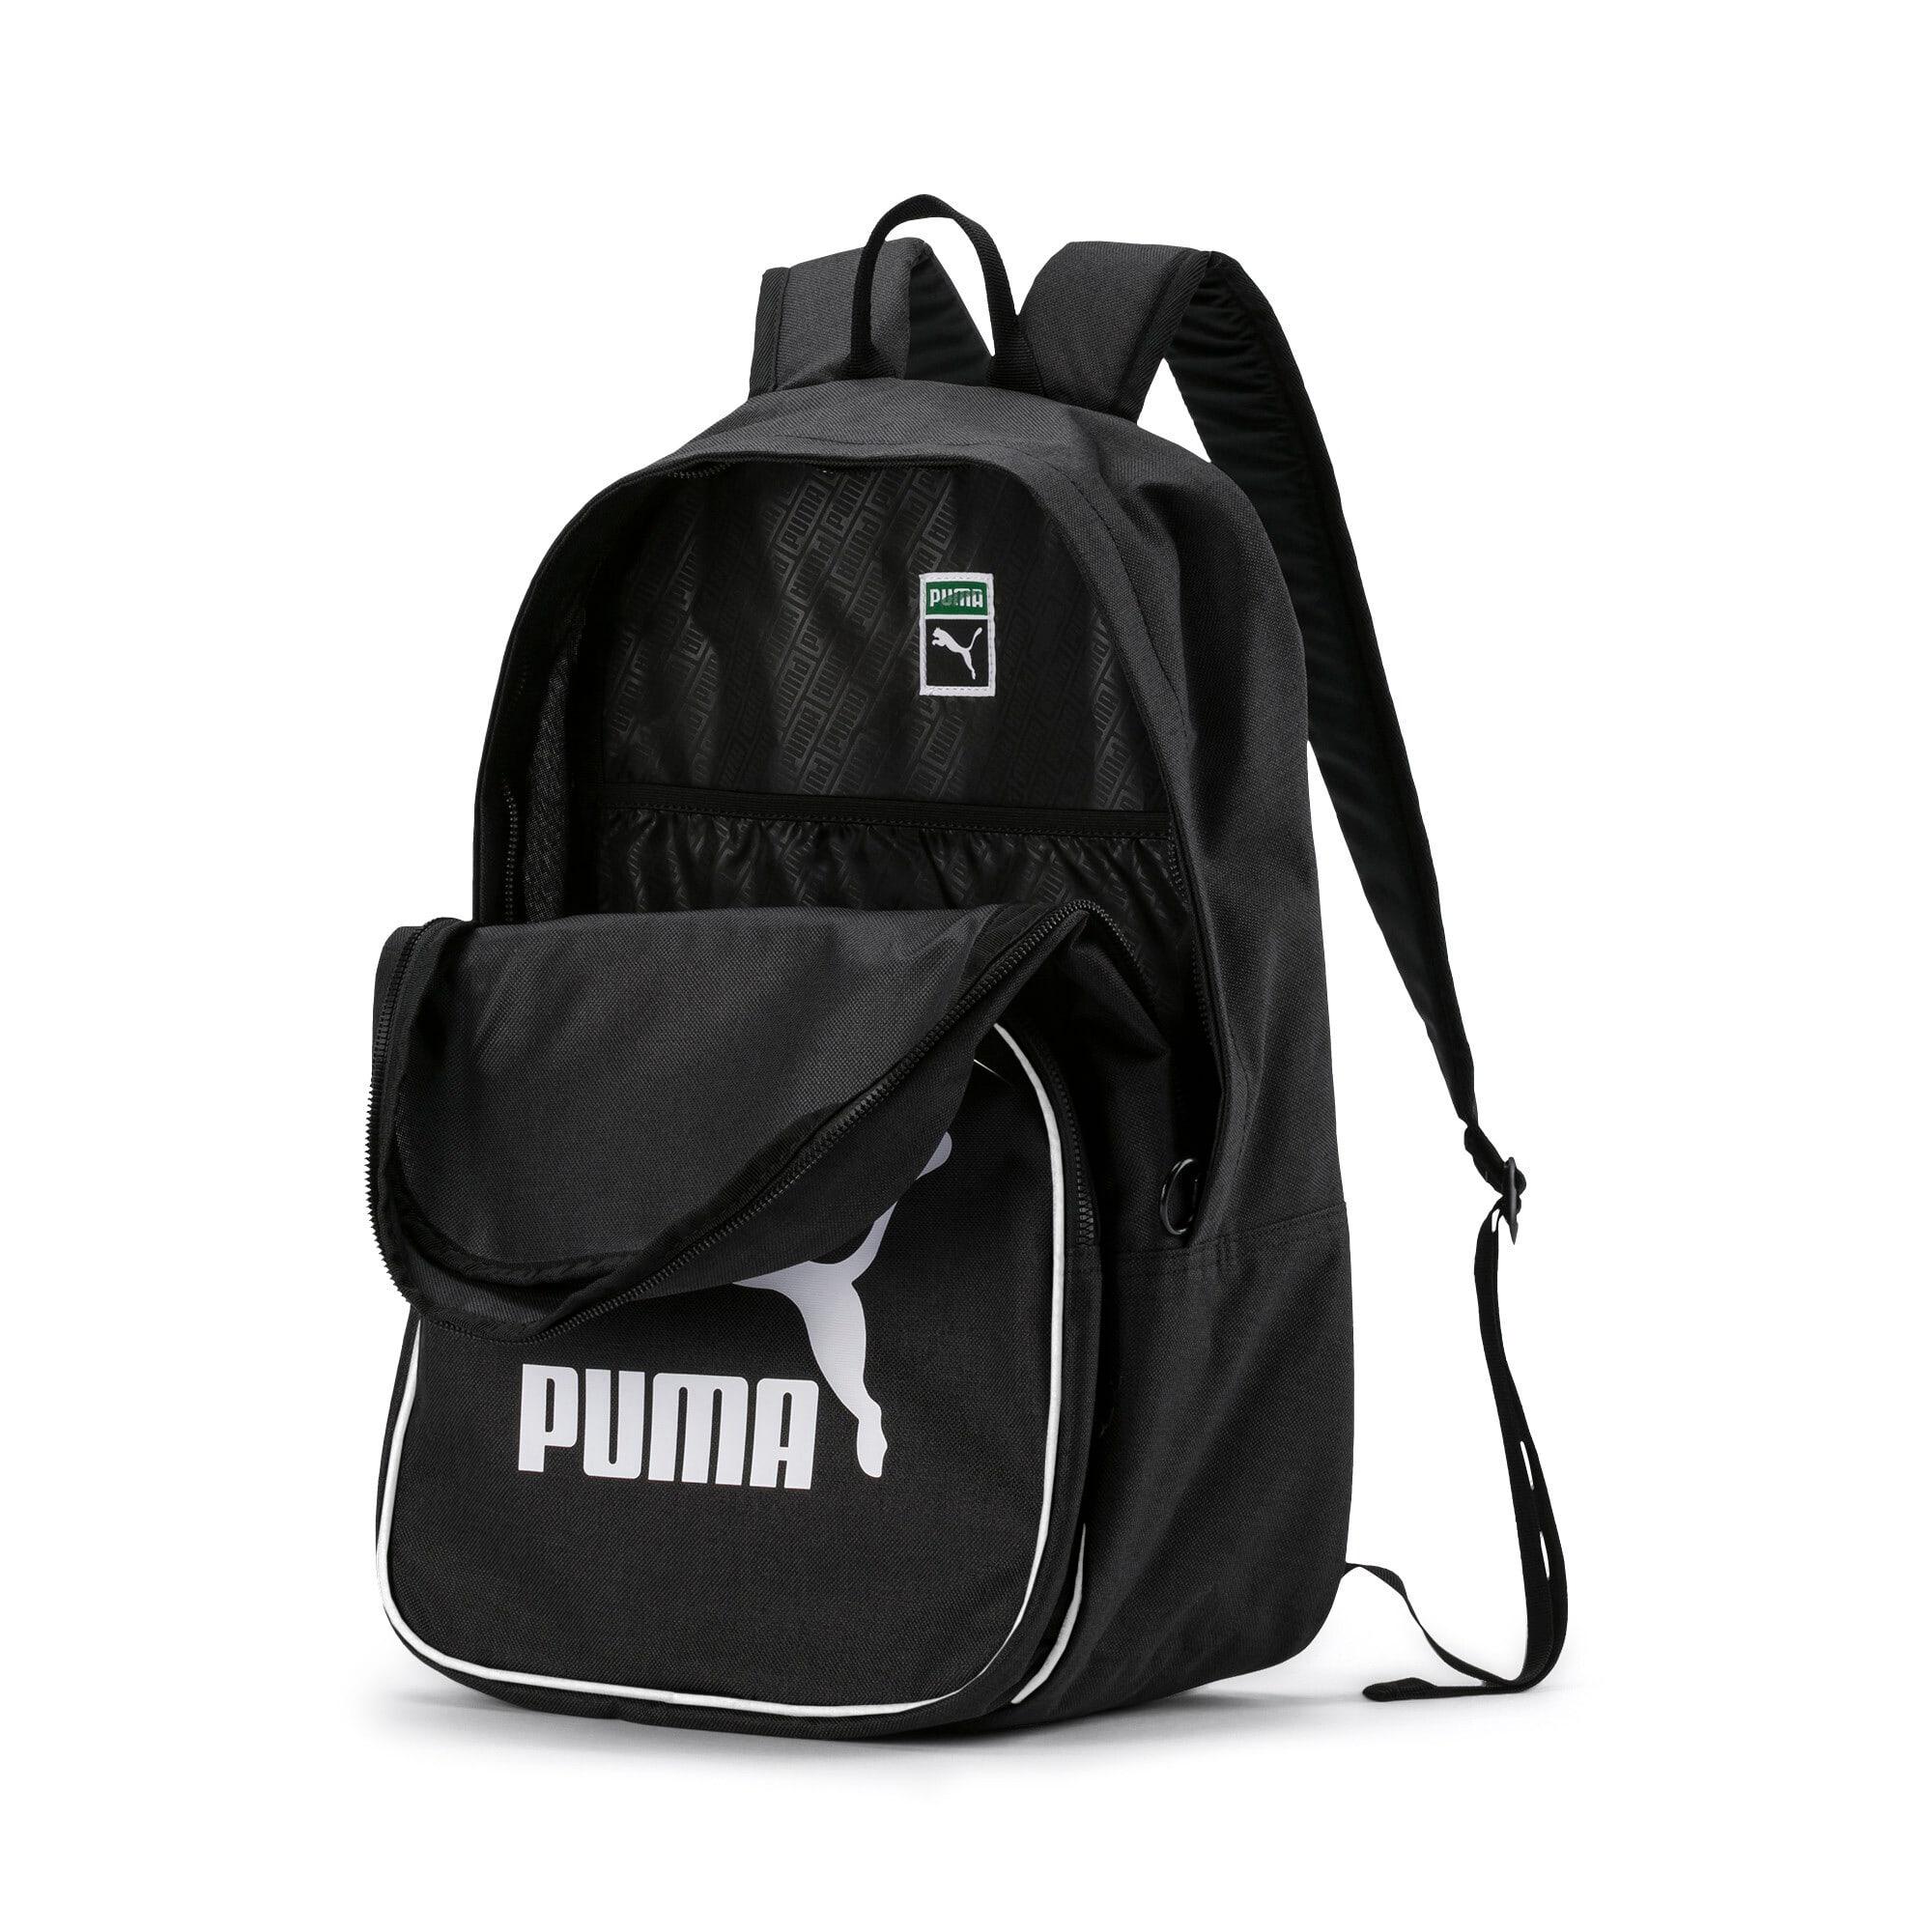 Thumbnail 6 of オリジナルス バックパック レトロ ウーブン 23L, Puma Black, medium-JPN